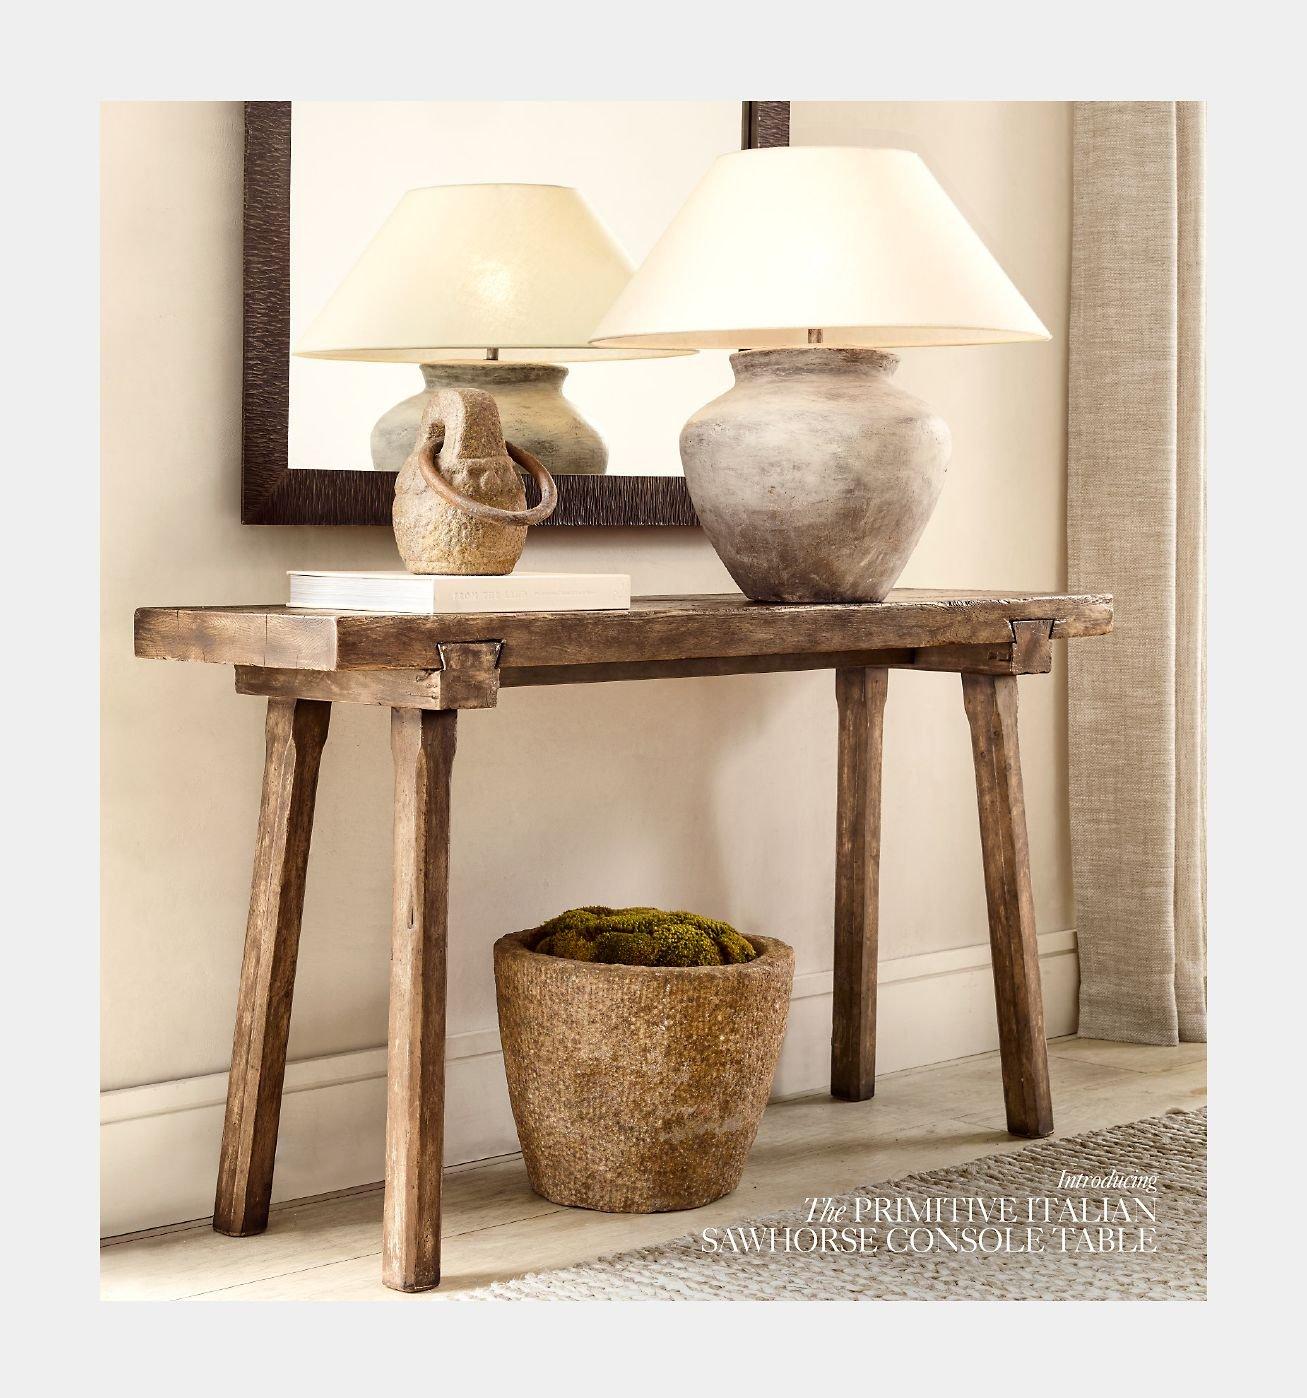 Enjoyable Restoration Hardware Introducing The Primitive Italian Machost Co Dining Chair Design Ideas Machostcouk